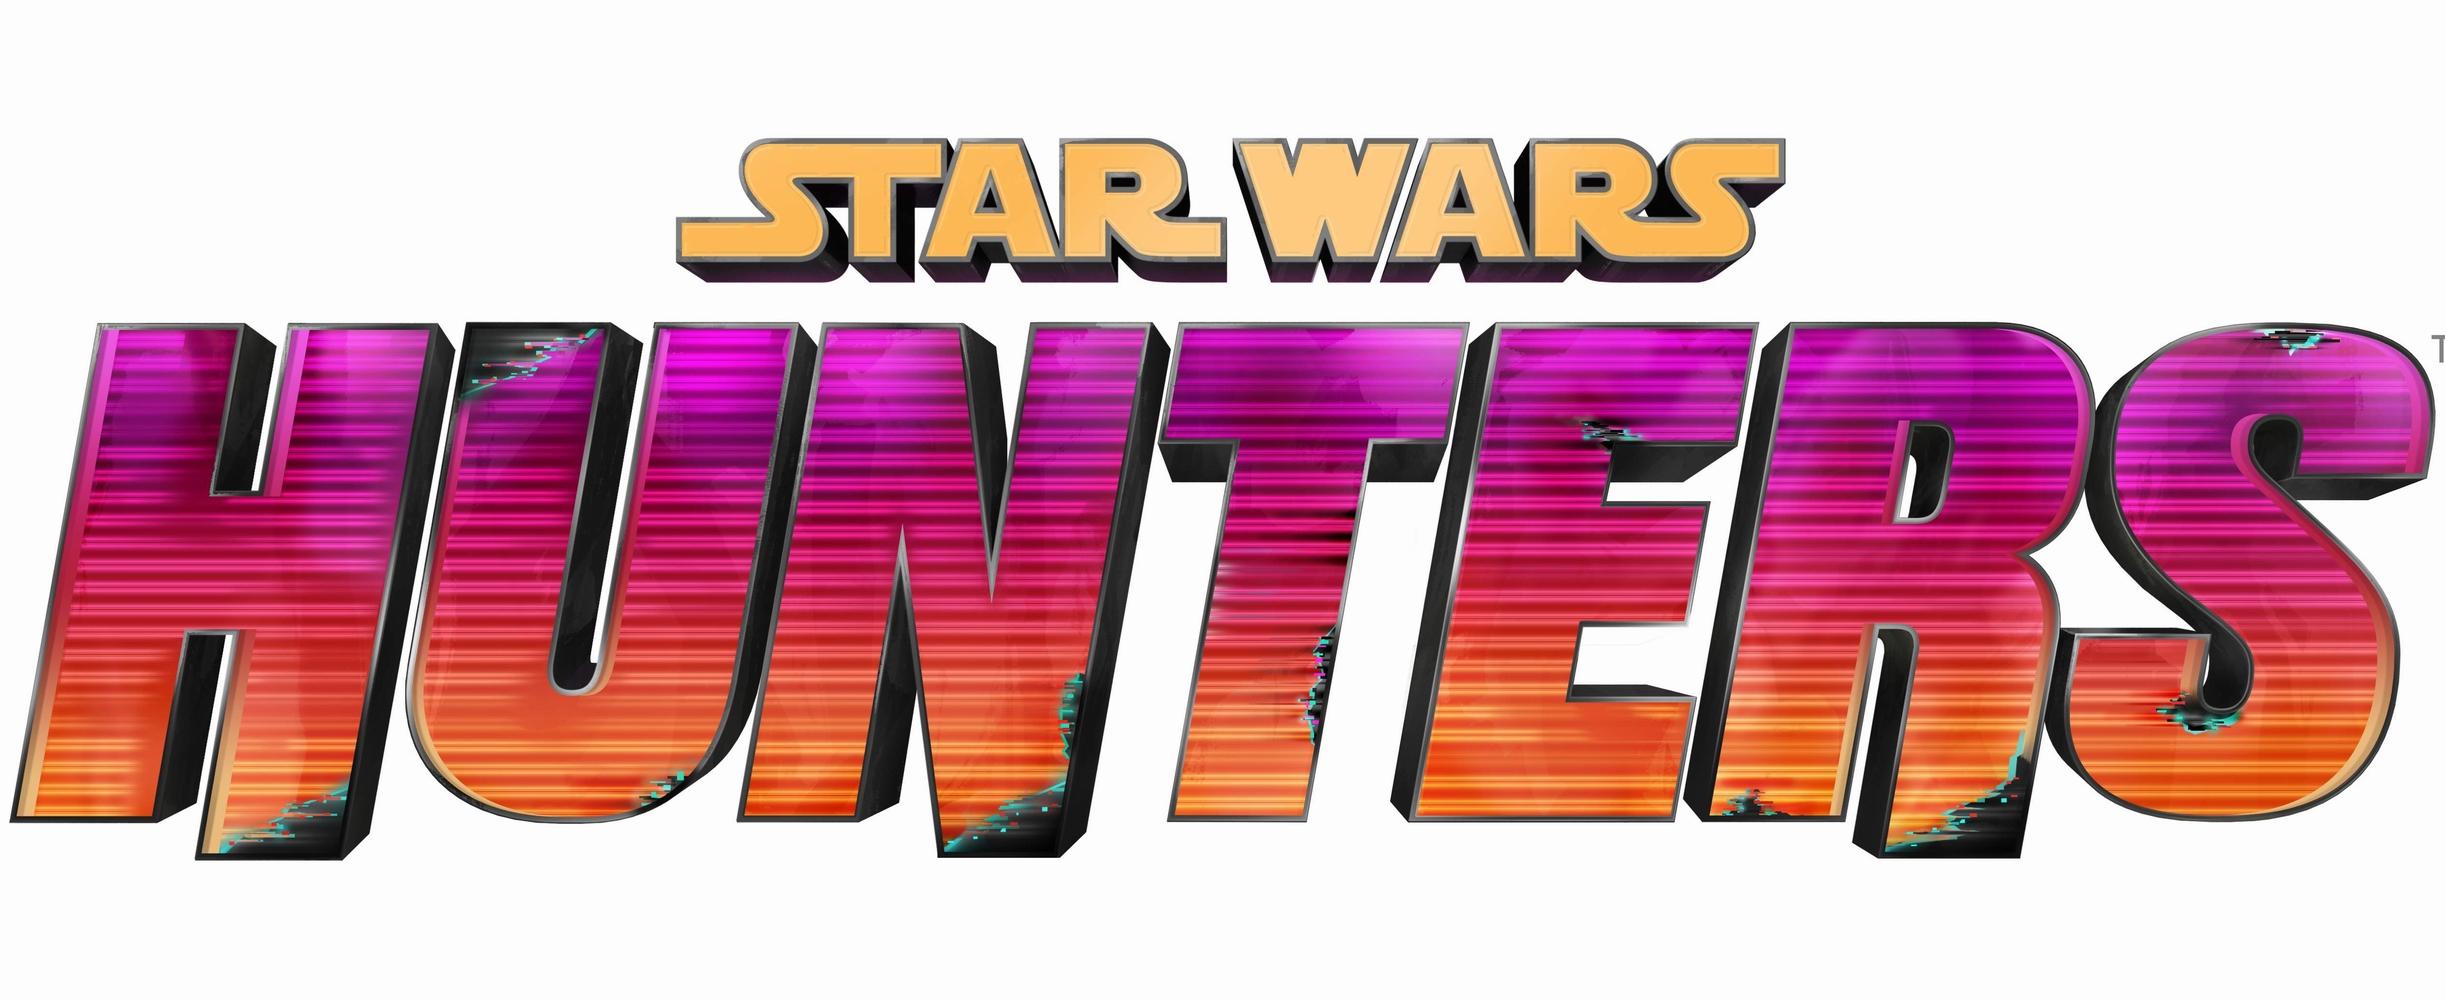 Zynga e Lucasfilm Games annunciano Star Wars: Hunters per Nintendo Switch